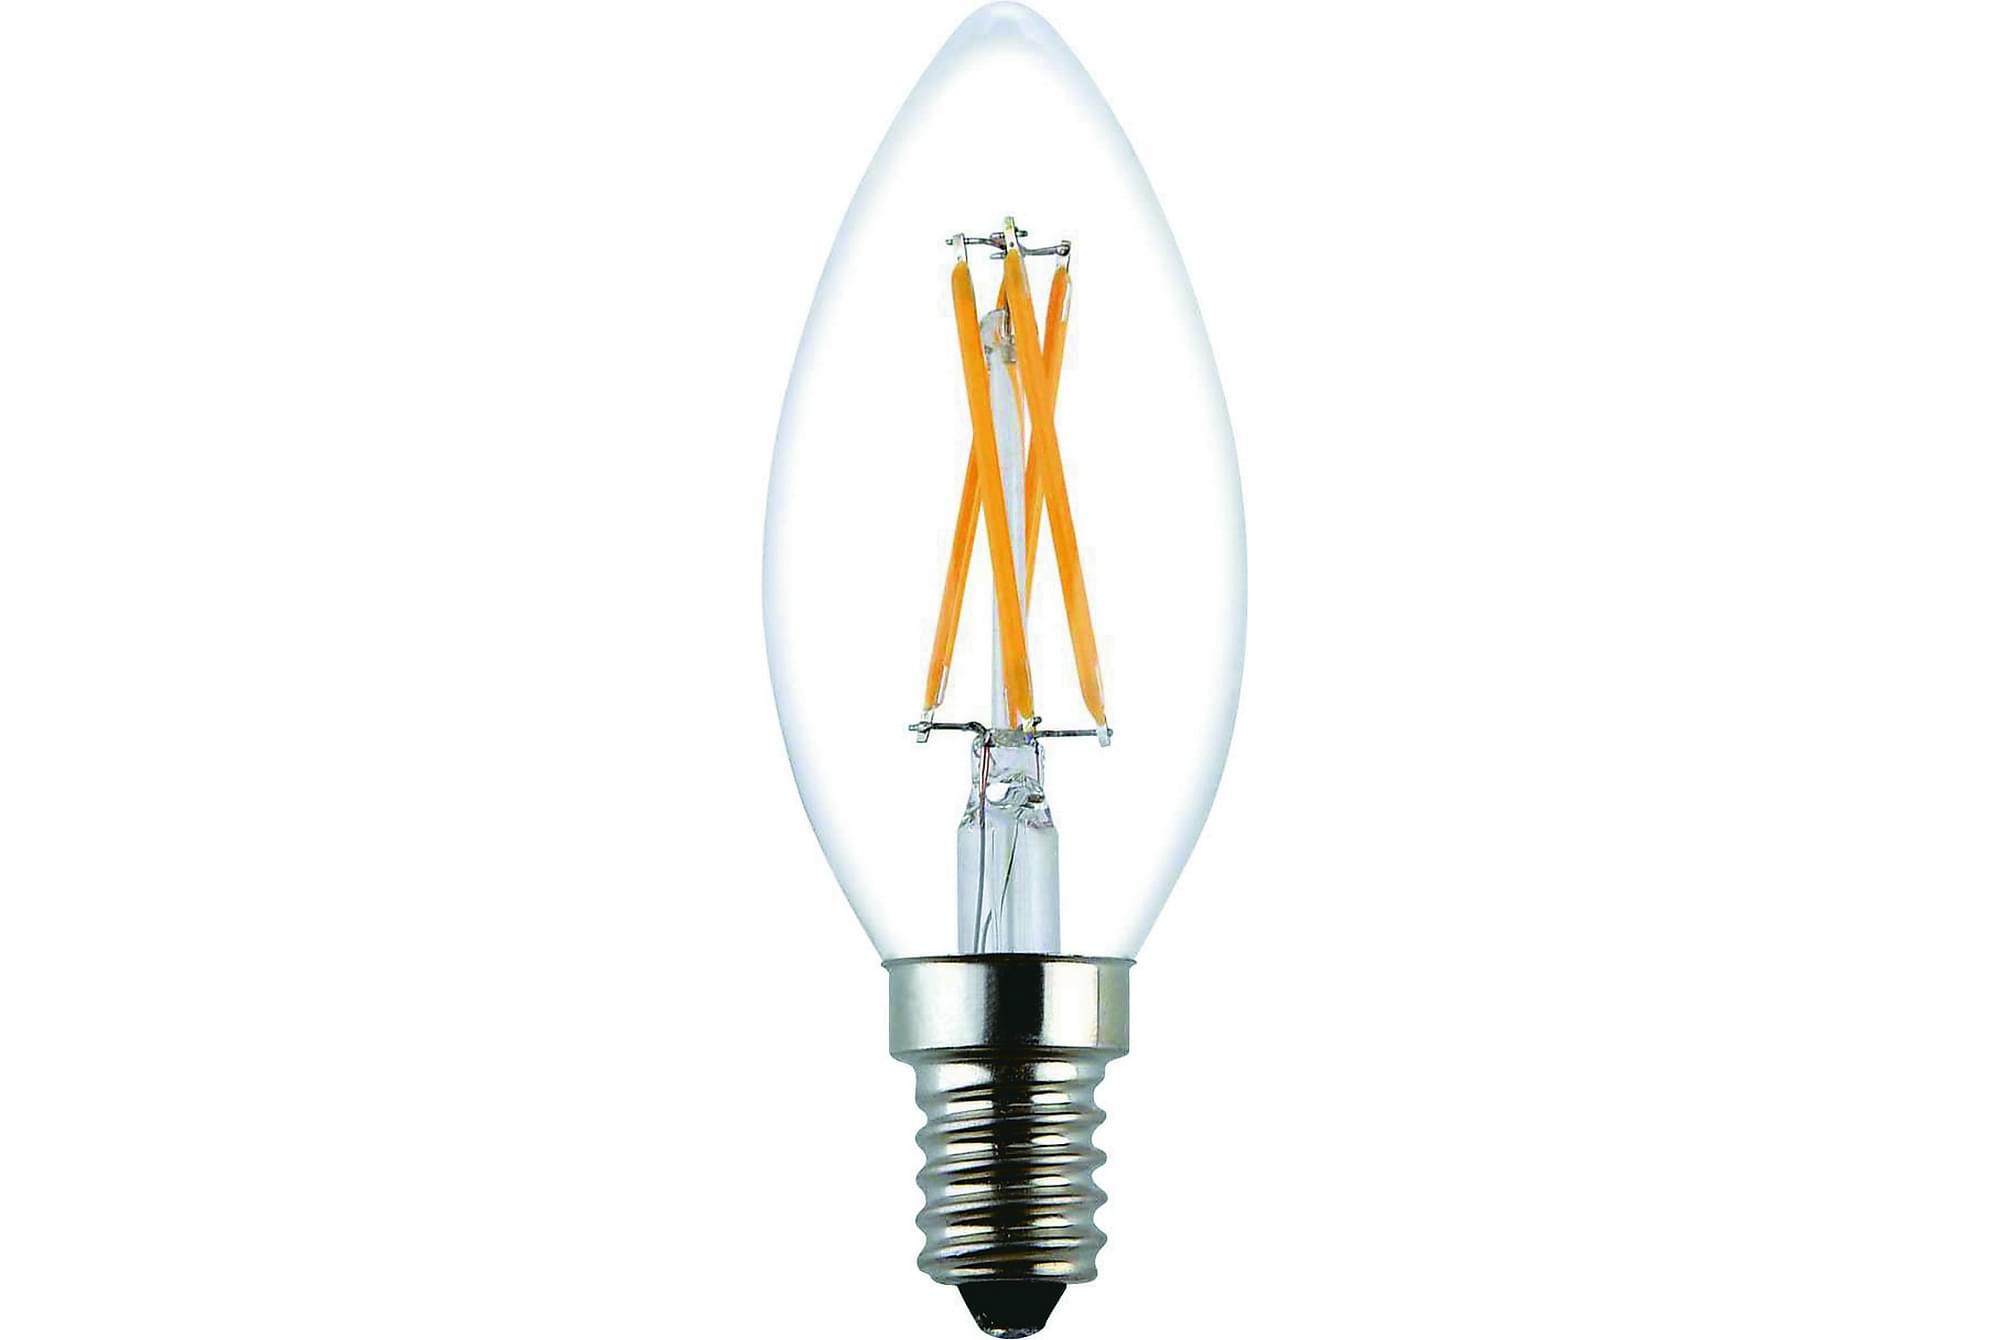 JUNG LED-lampa 3,6W E14 Dim Filament Klar, Glödlampor & ljuskällor